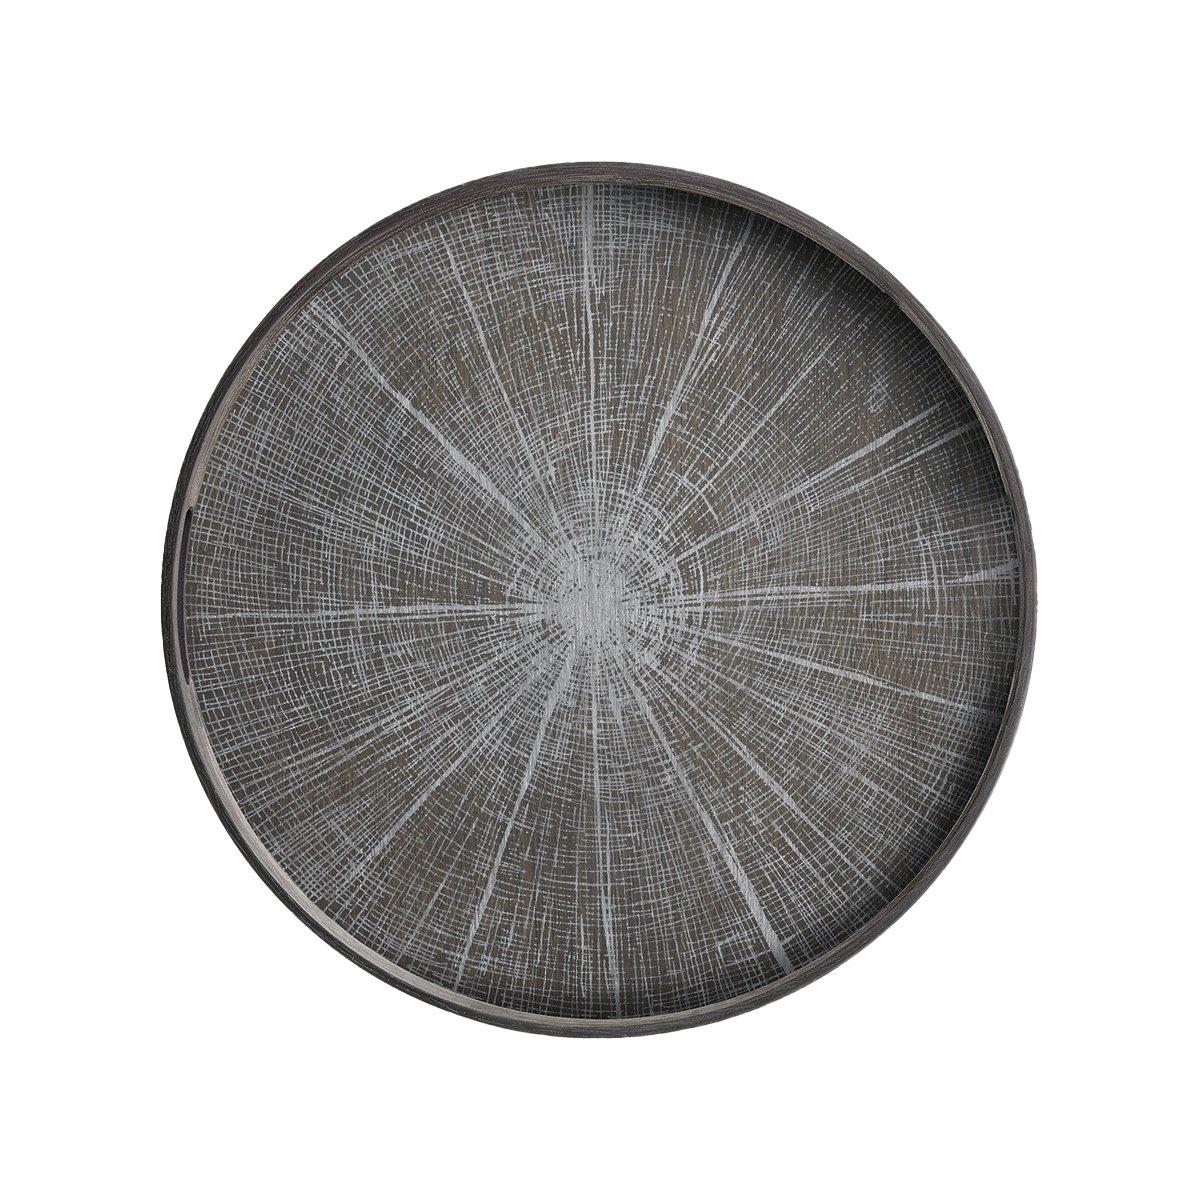 Ethnicraft White Slice Dienblad �48 centimeter